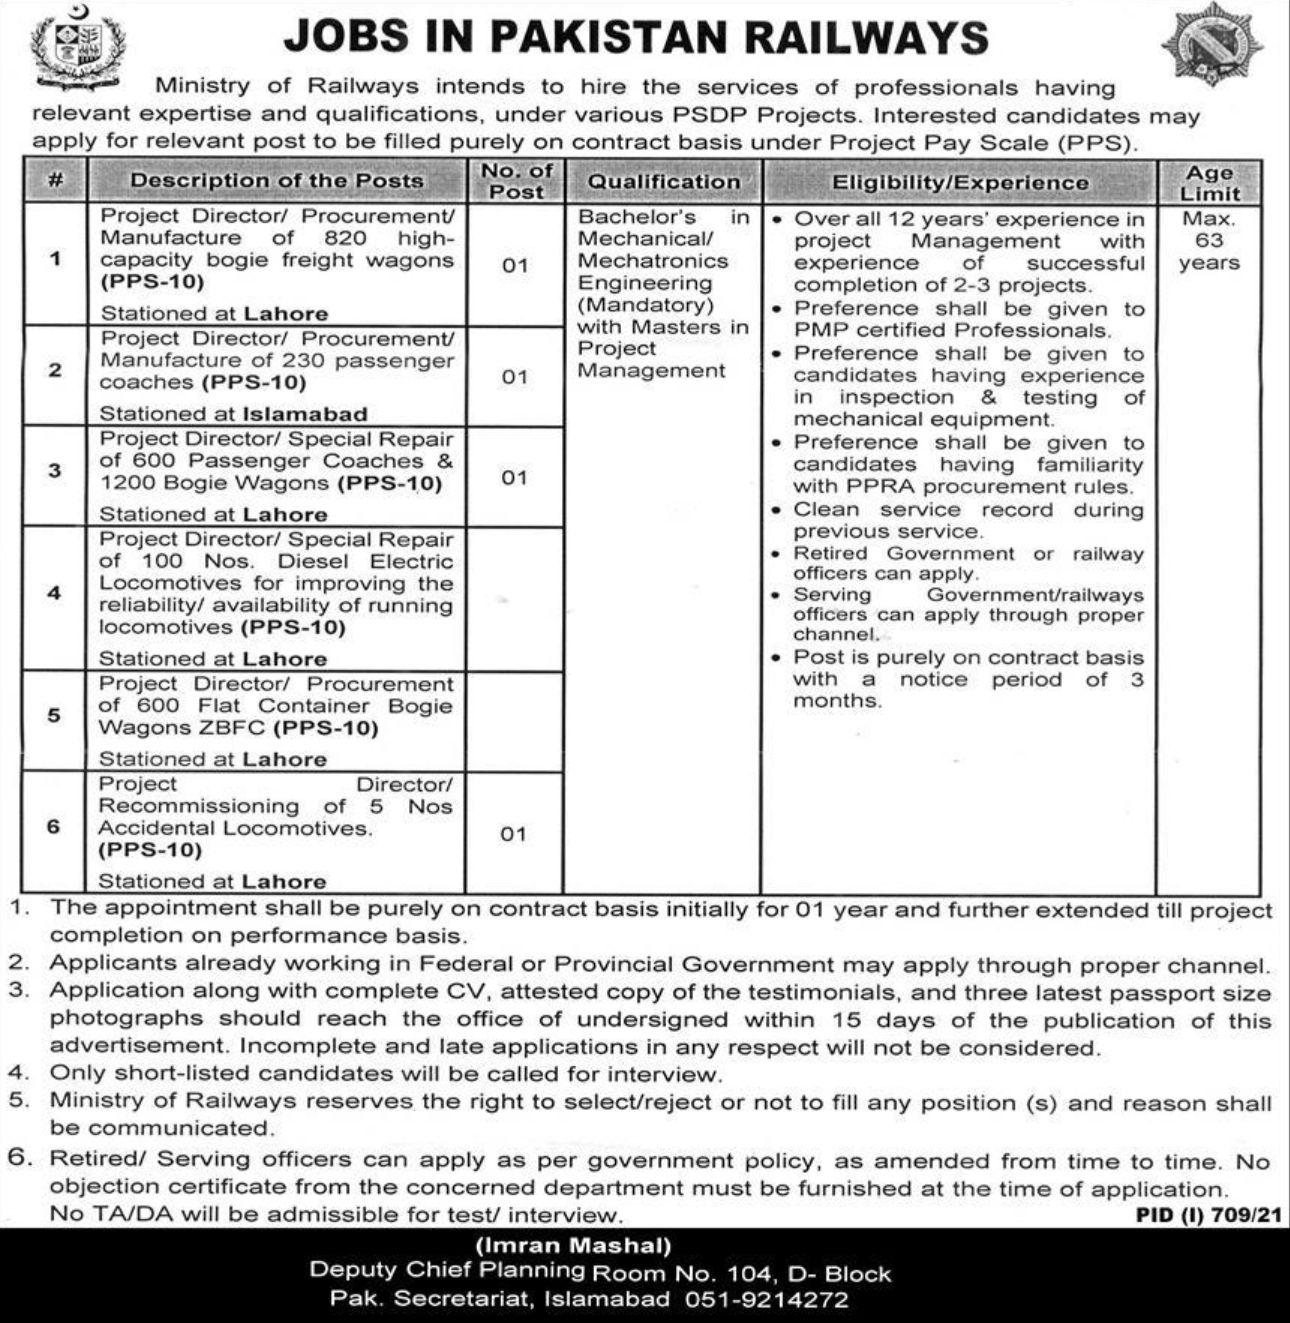 Government of Pakistan – Ministry of Railways Vacancies 2021 3